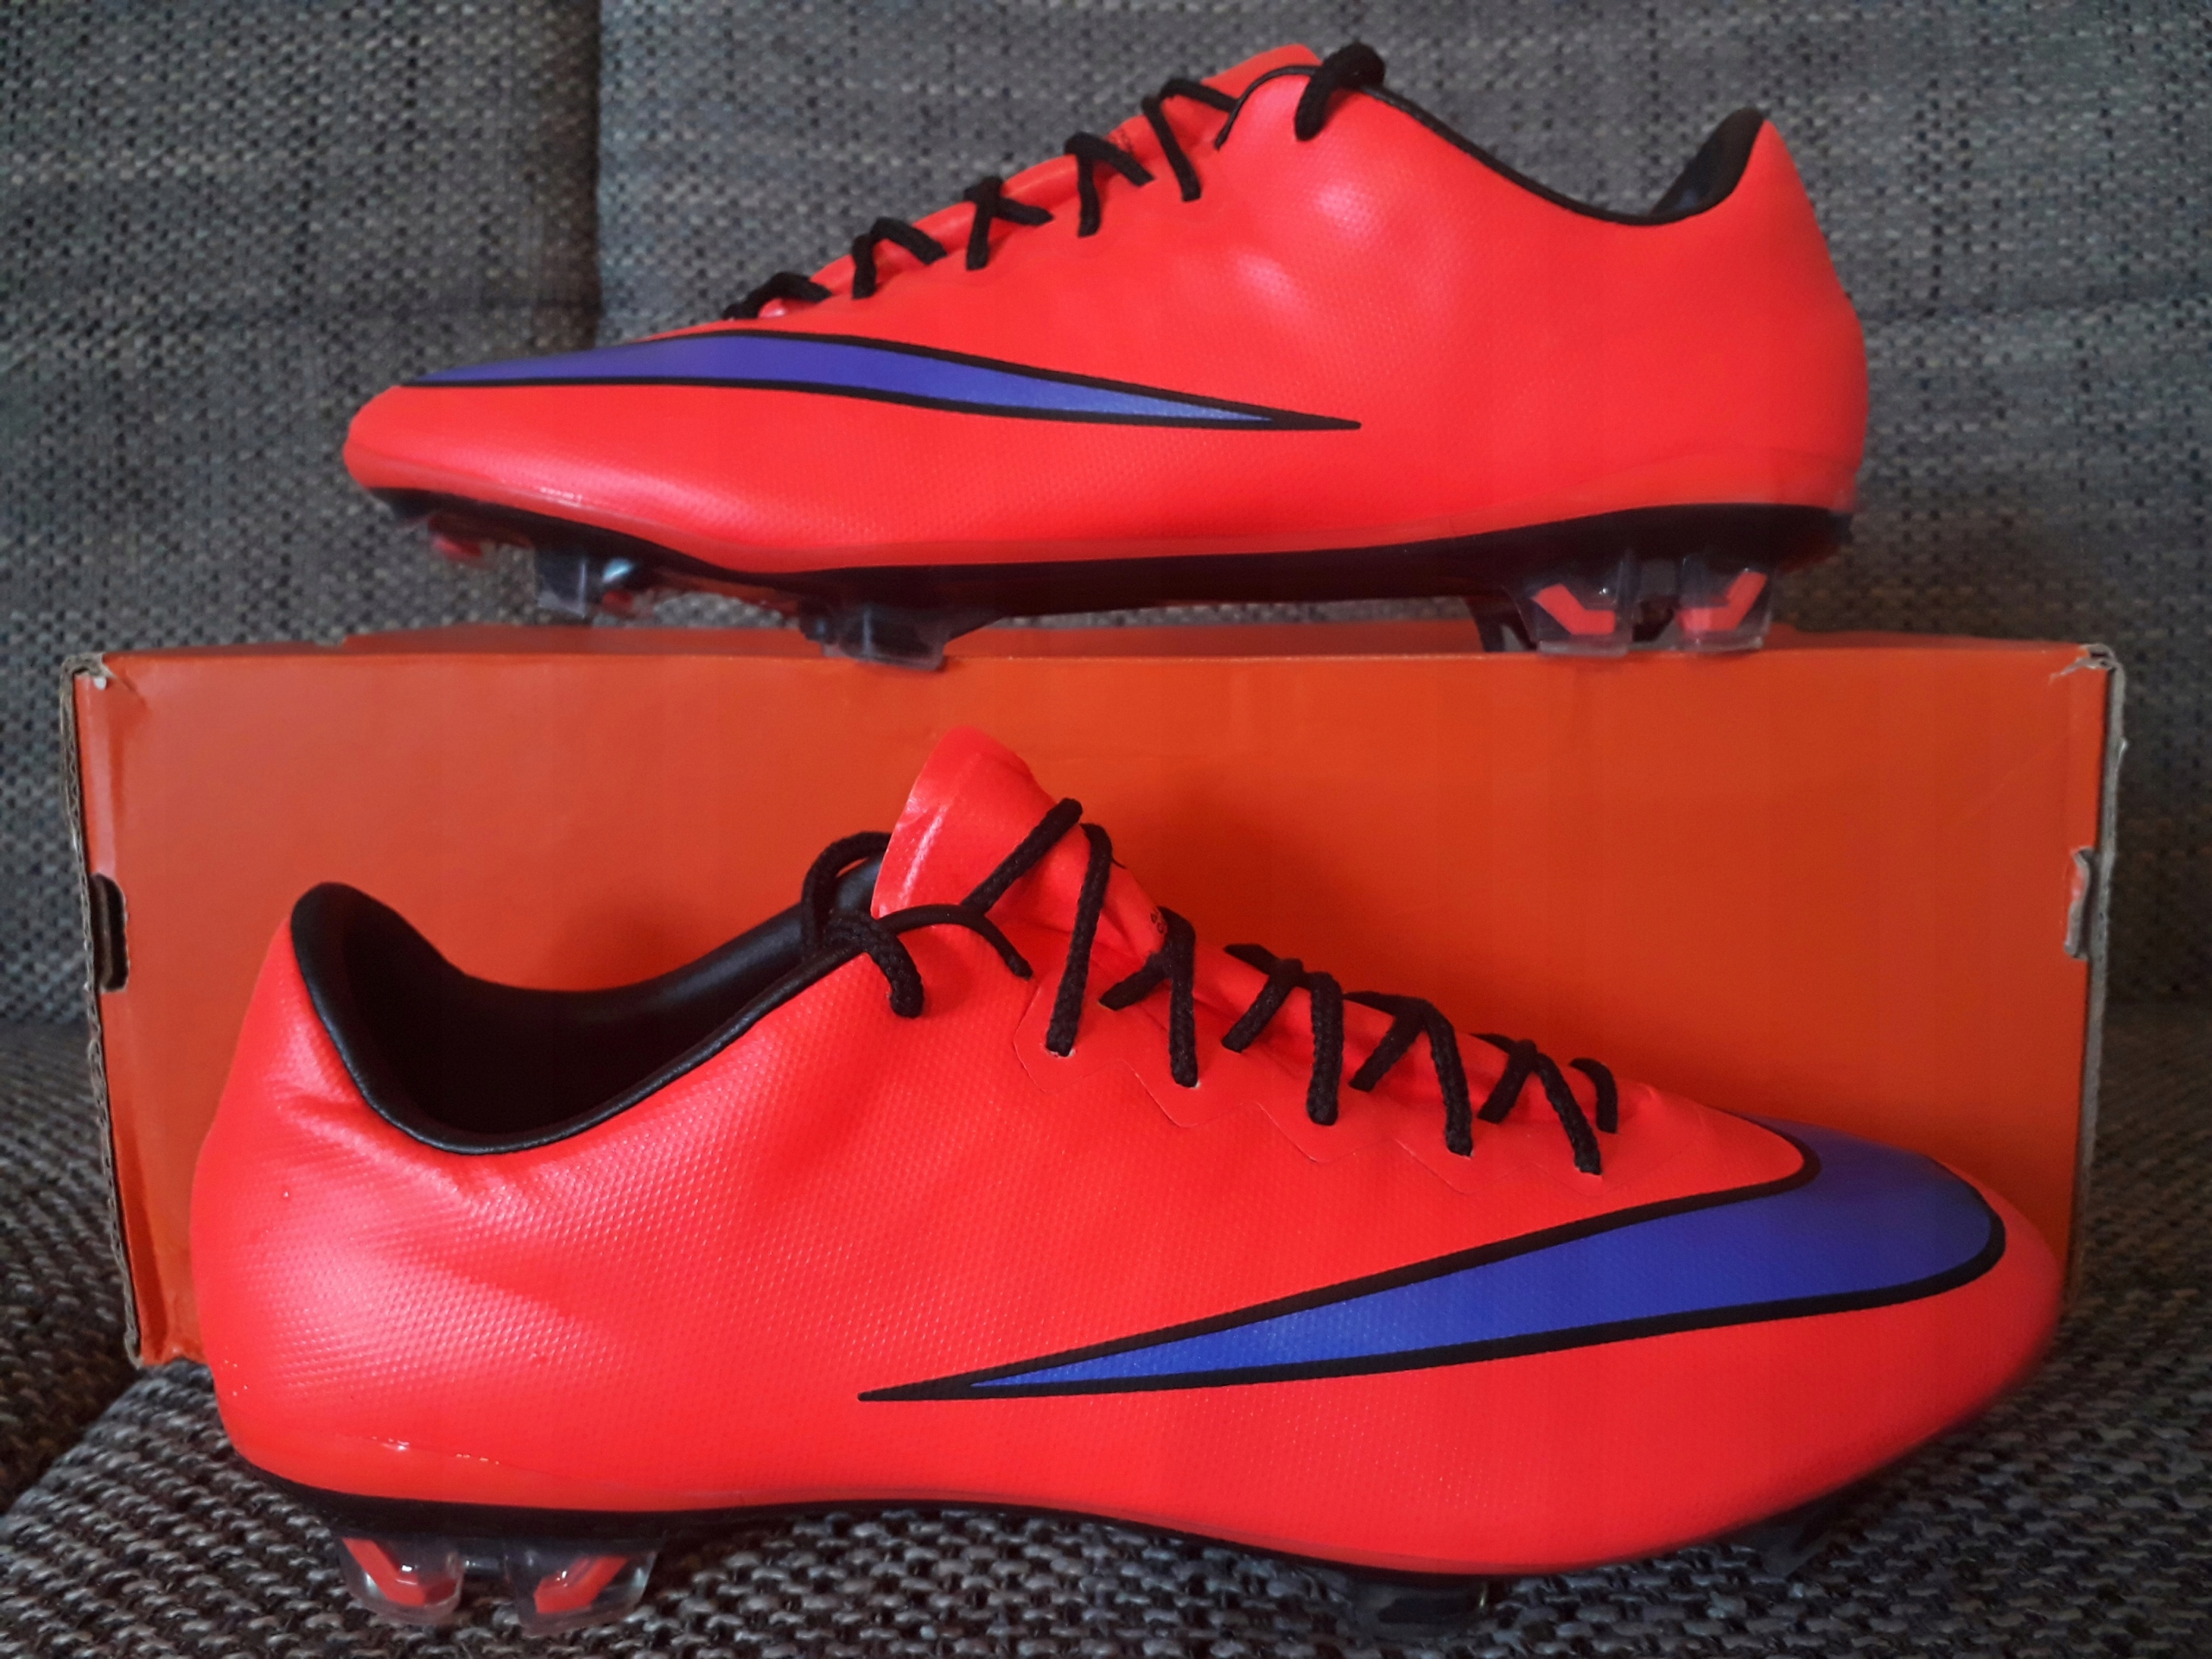 adidas UltraBoost AQ0062 CblackClowhiCarbon Schuhe Online